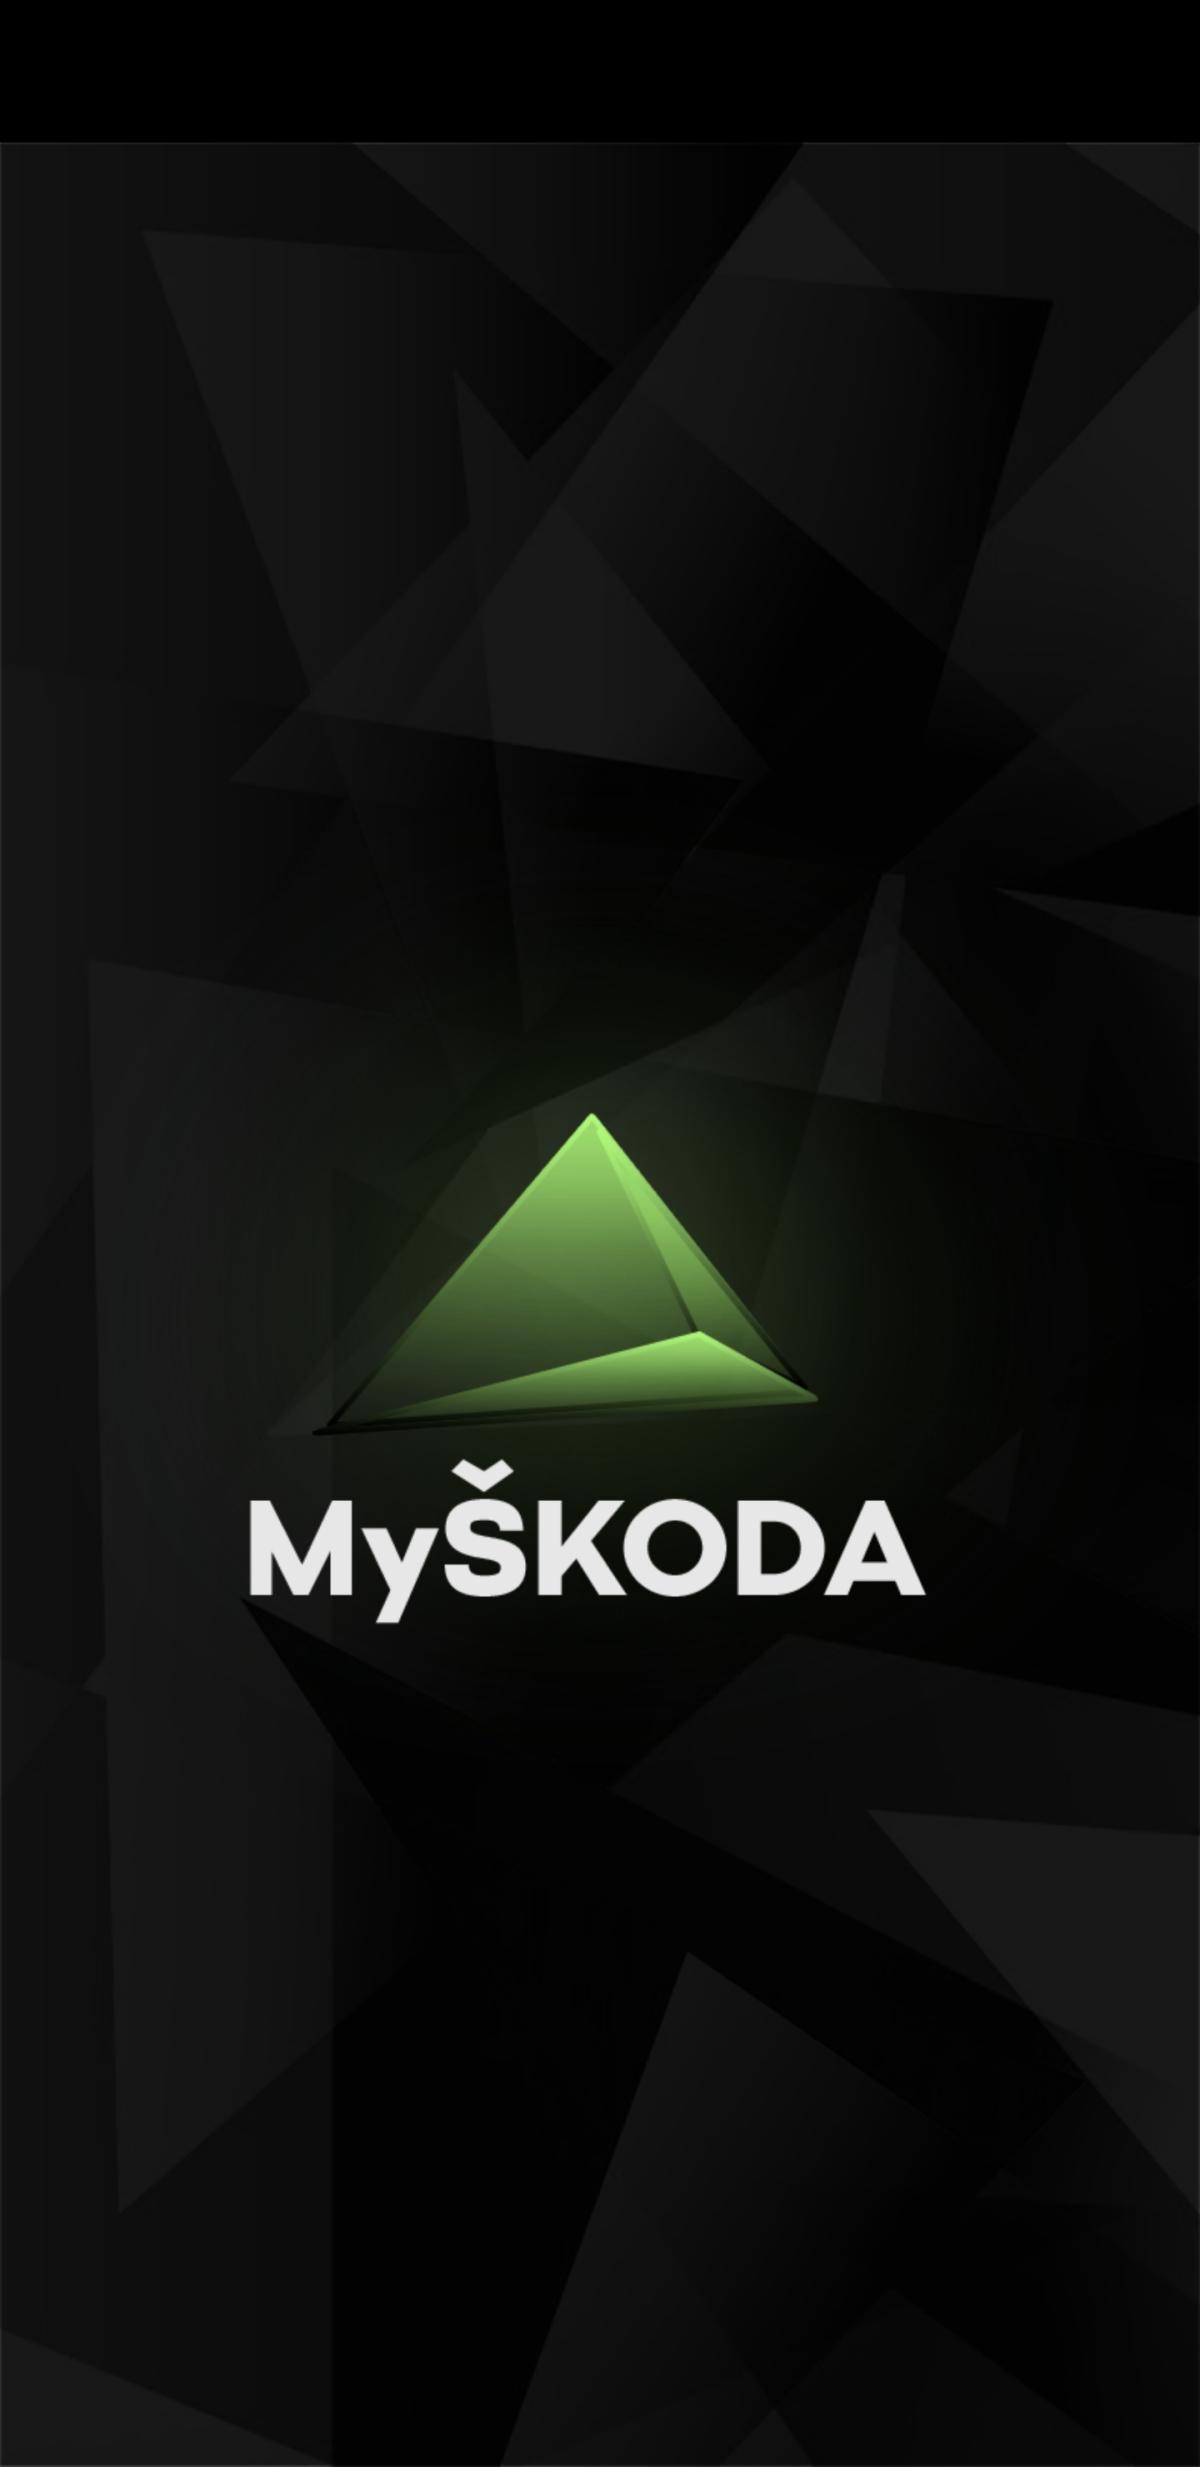 My Skoda app: Appsolutely Transparent